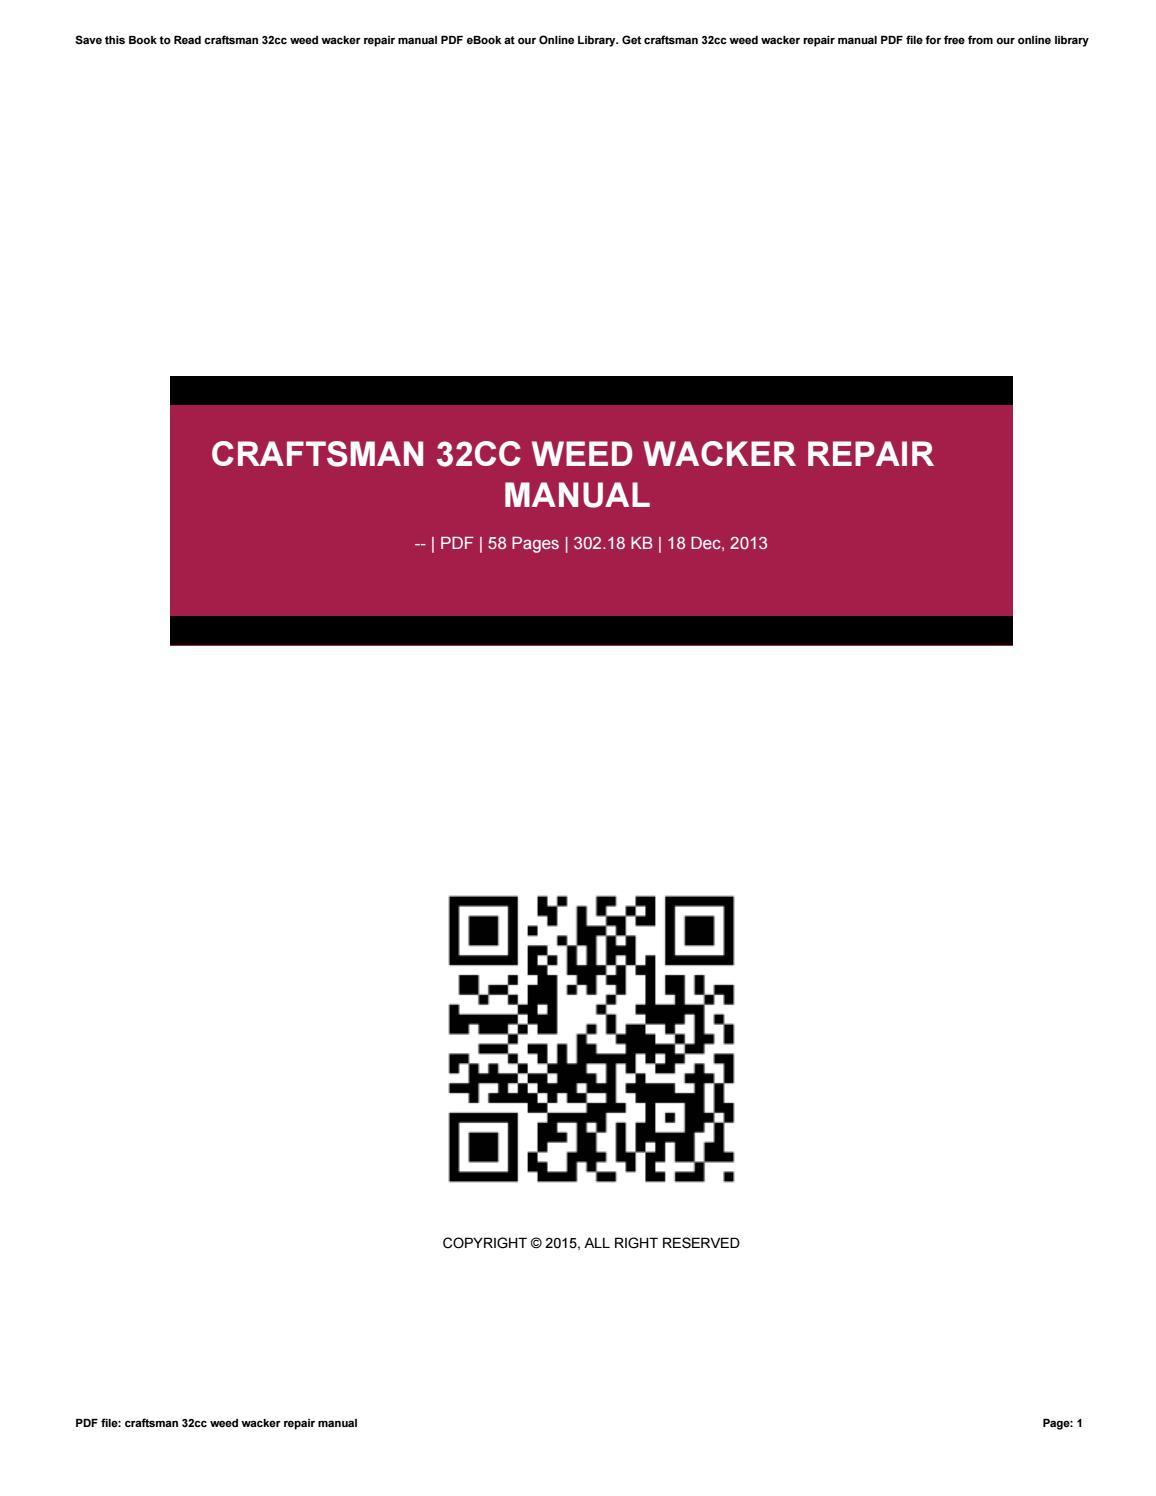 2000 Ford Focus Repair Manual Ebook Wiring Library Diagram Opel Blazer Montera Ebooks U2022 Rh Justusermanual Today Array Weed Eater Web